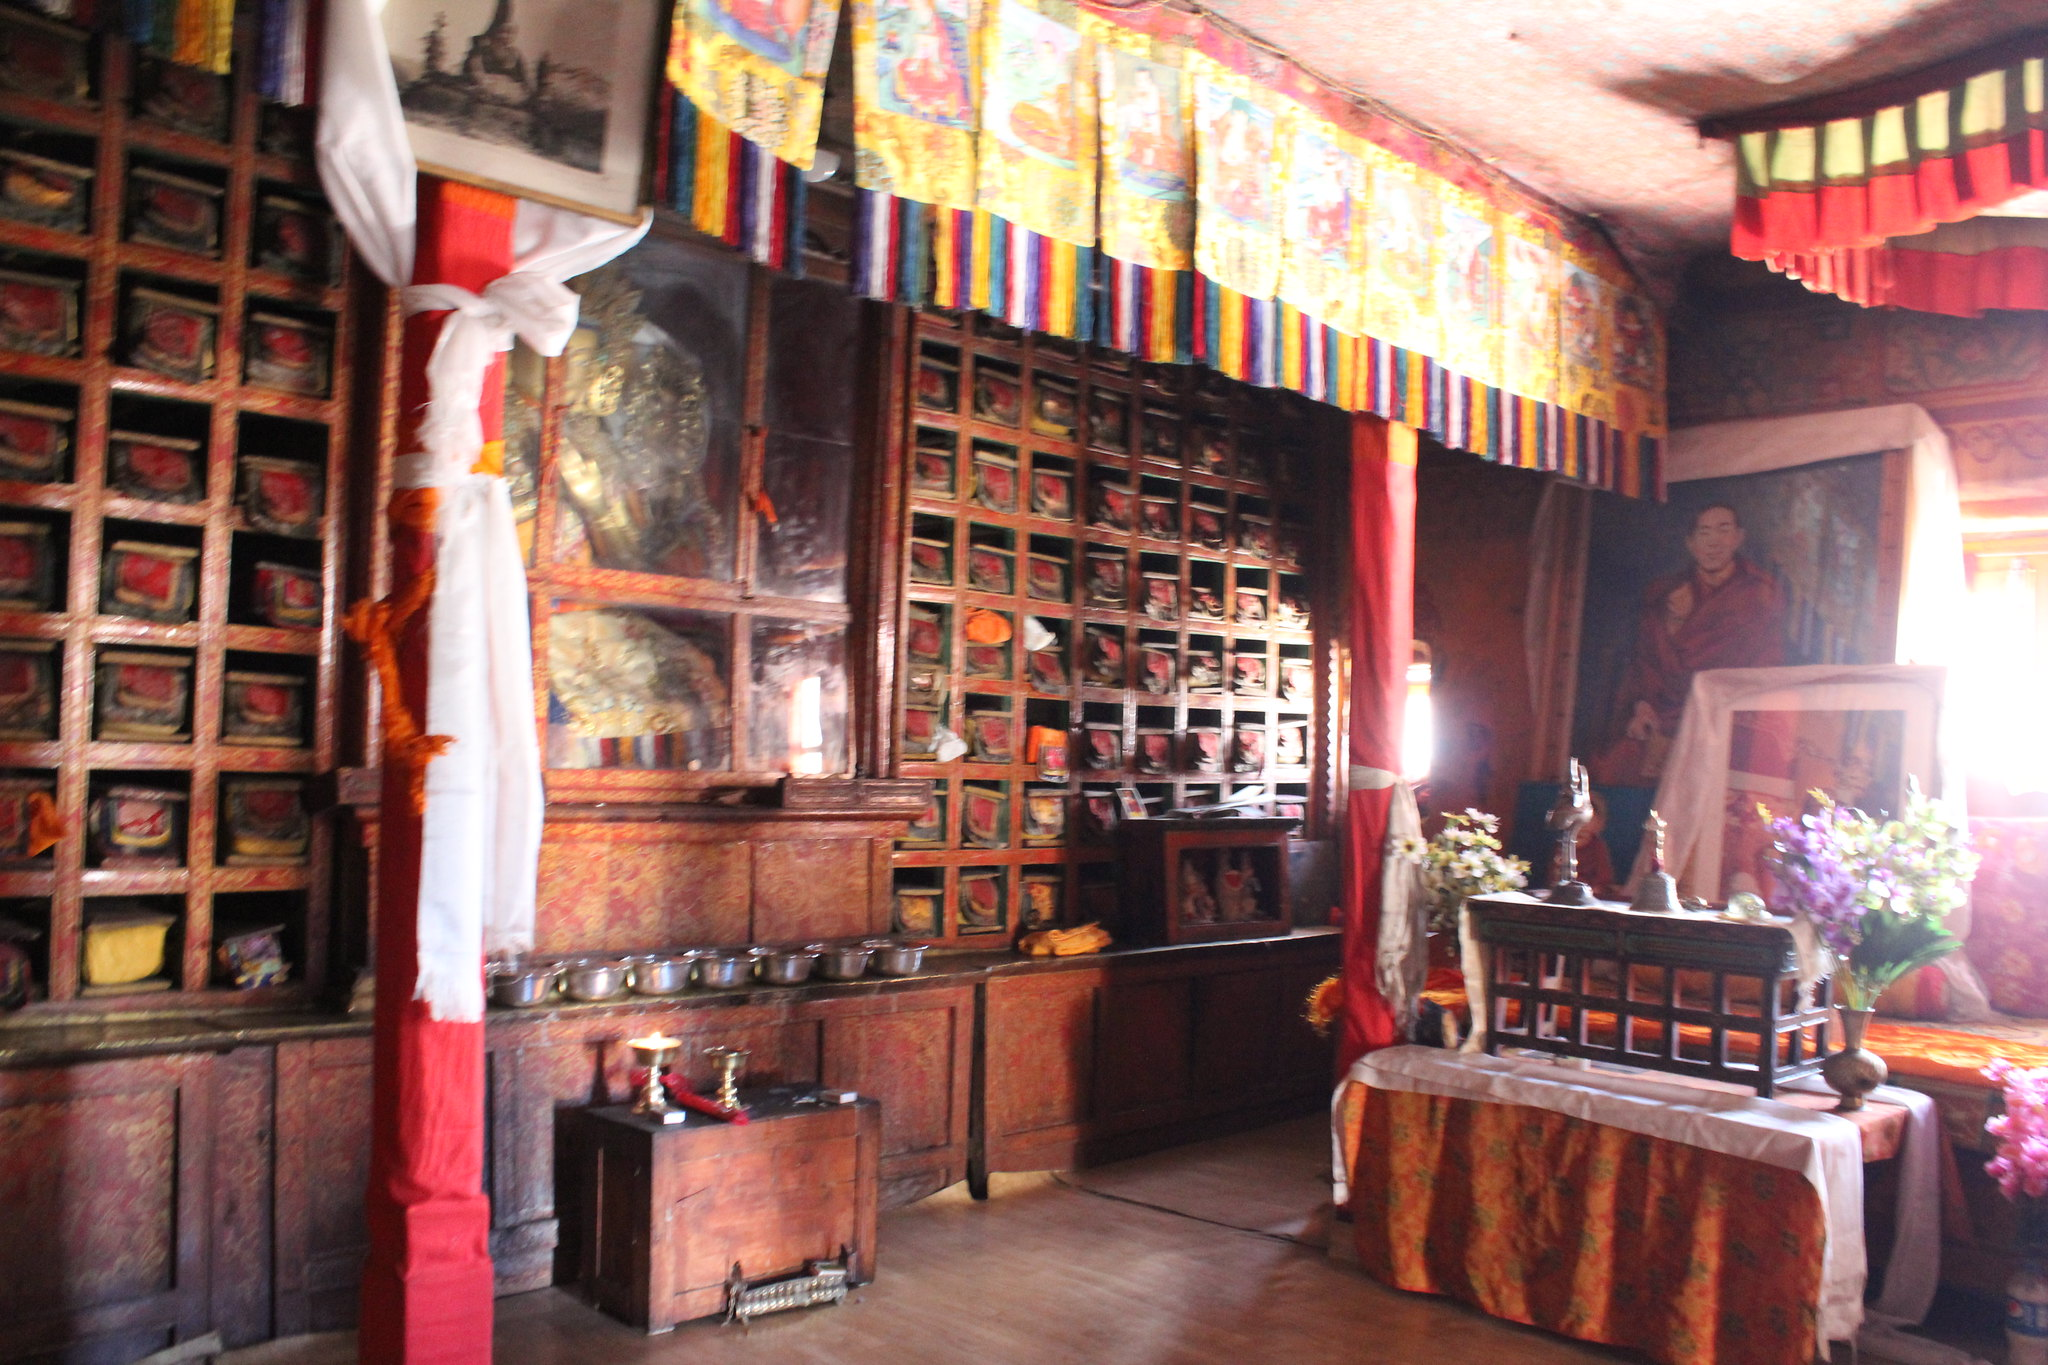 Inside Kye Monastery